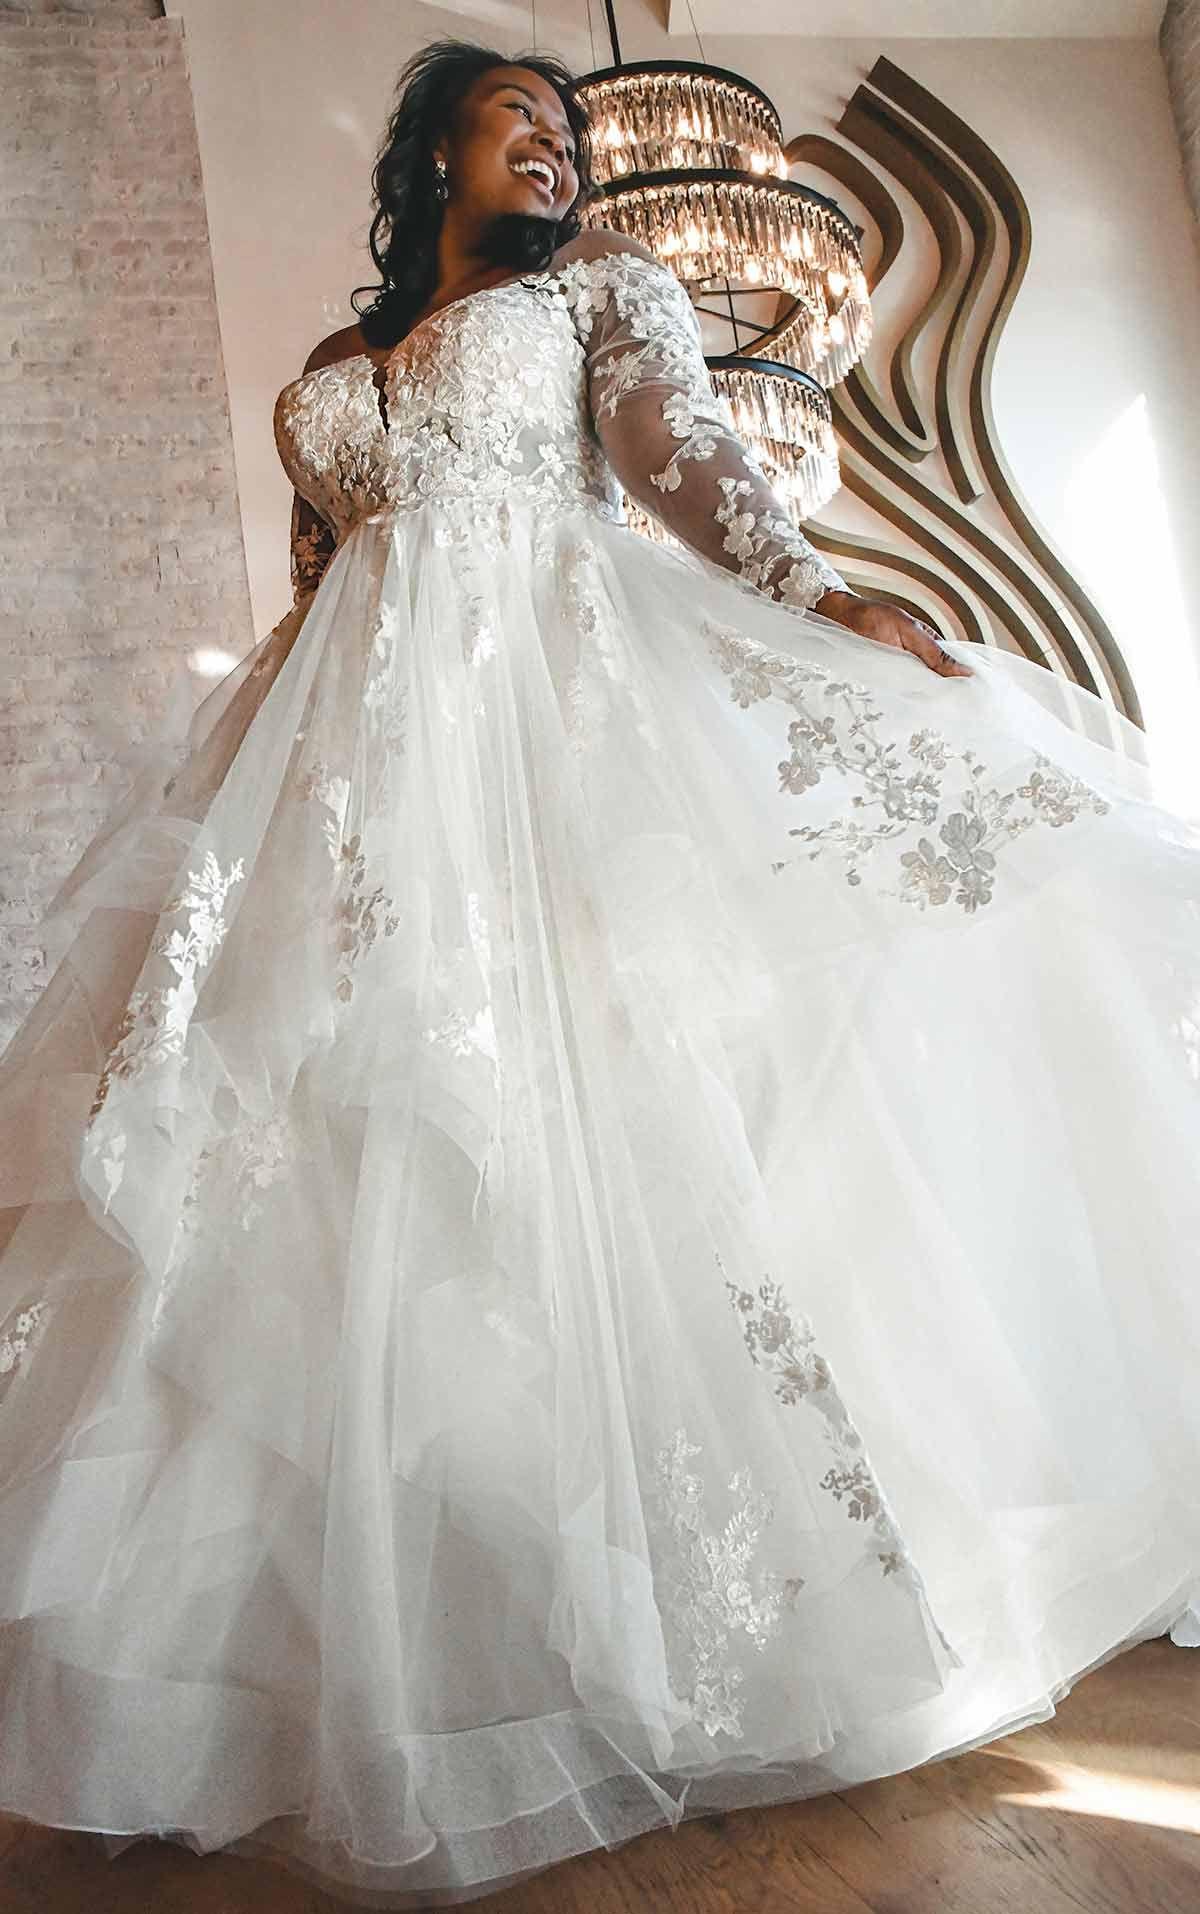 Off Shoulder Lace Plus Size Ballgown With Tiered Skirt Essense Of Australia Wedding D In 2021 Essense Of Australia Wedding Dresses Wedding Dresses Plus Size Ballgown [ 1914 x 1200 Pixel ]